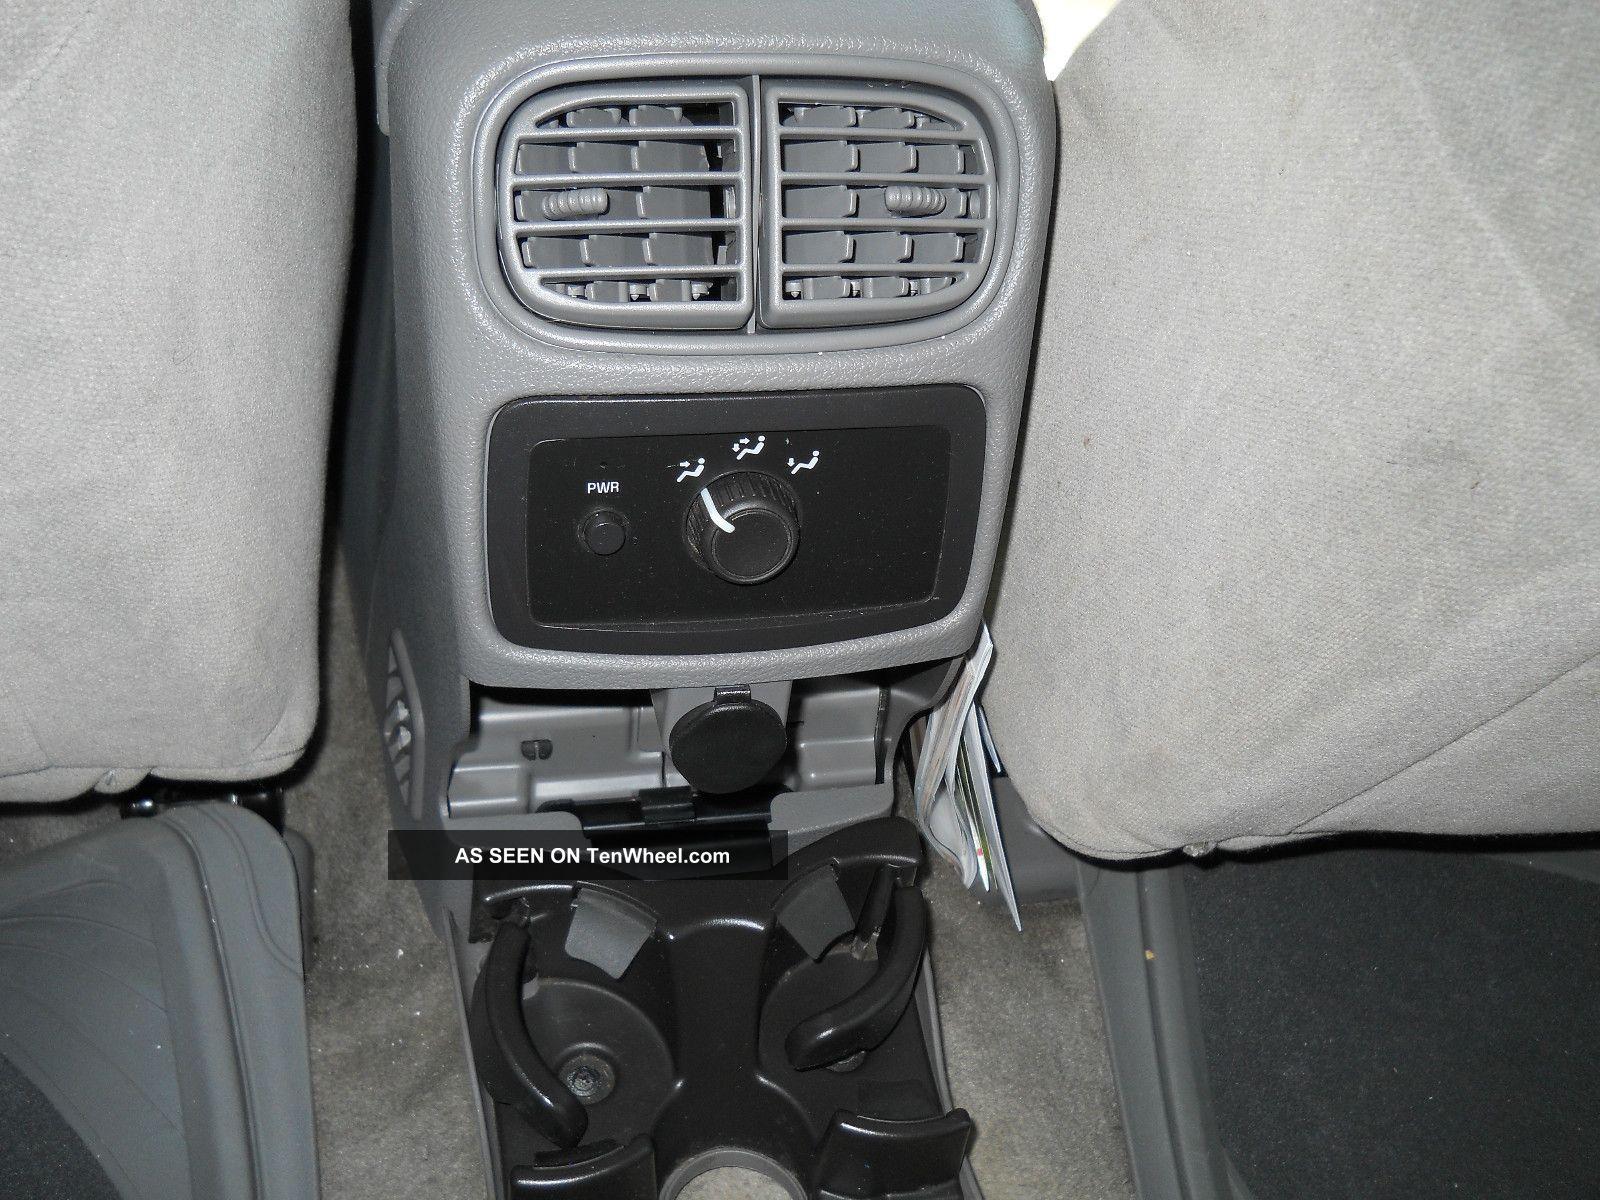 Trailblazer 2006 Interior 2006 Chevrolet Trailblazer ls